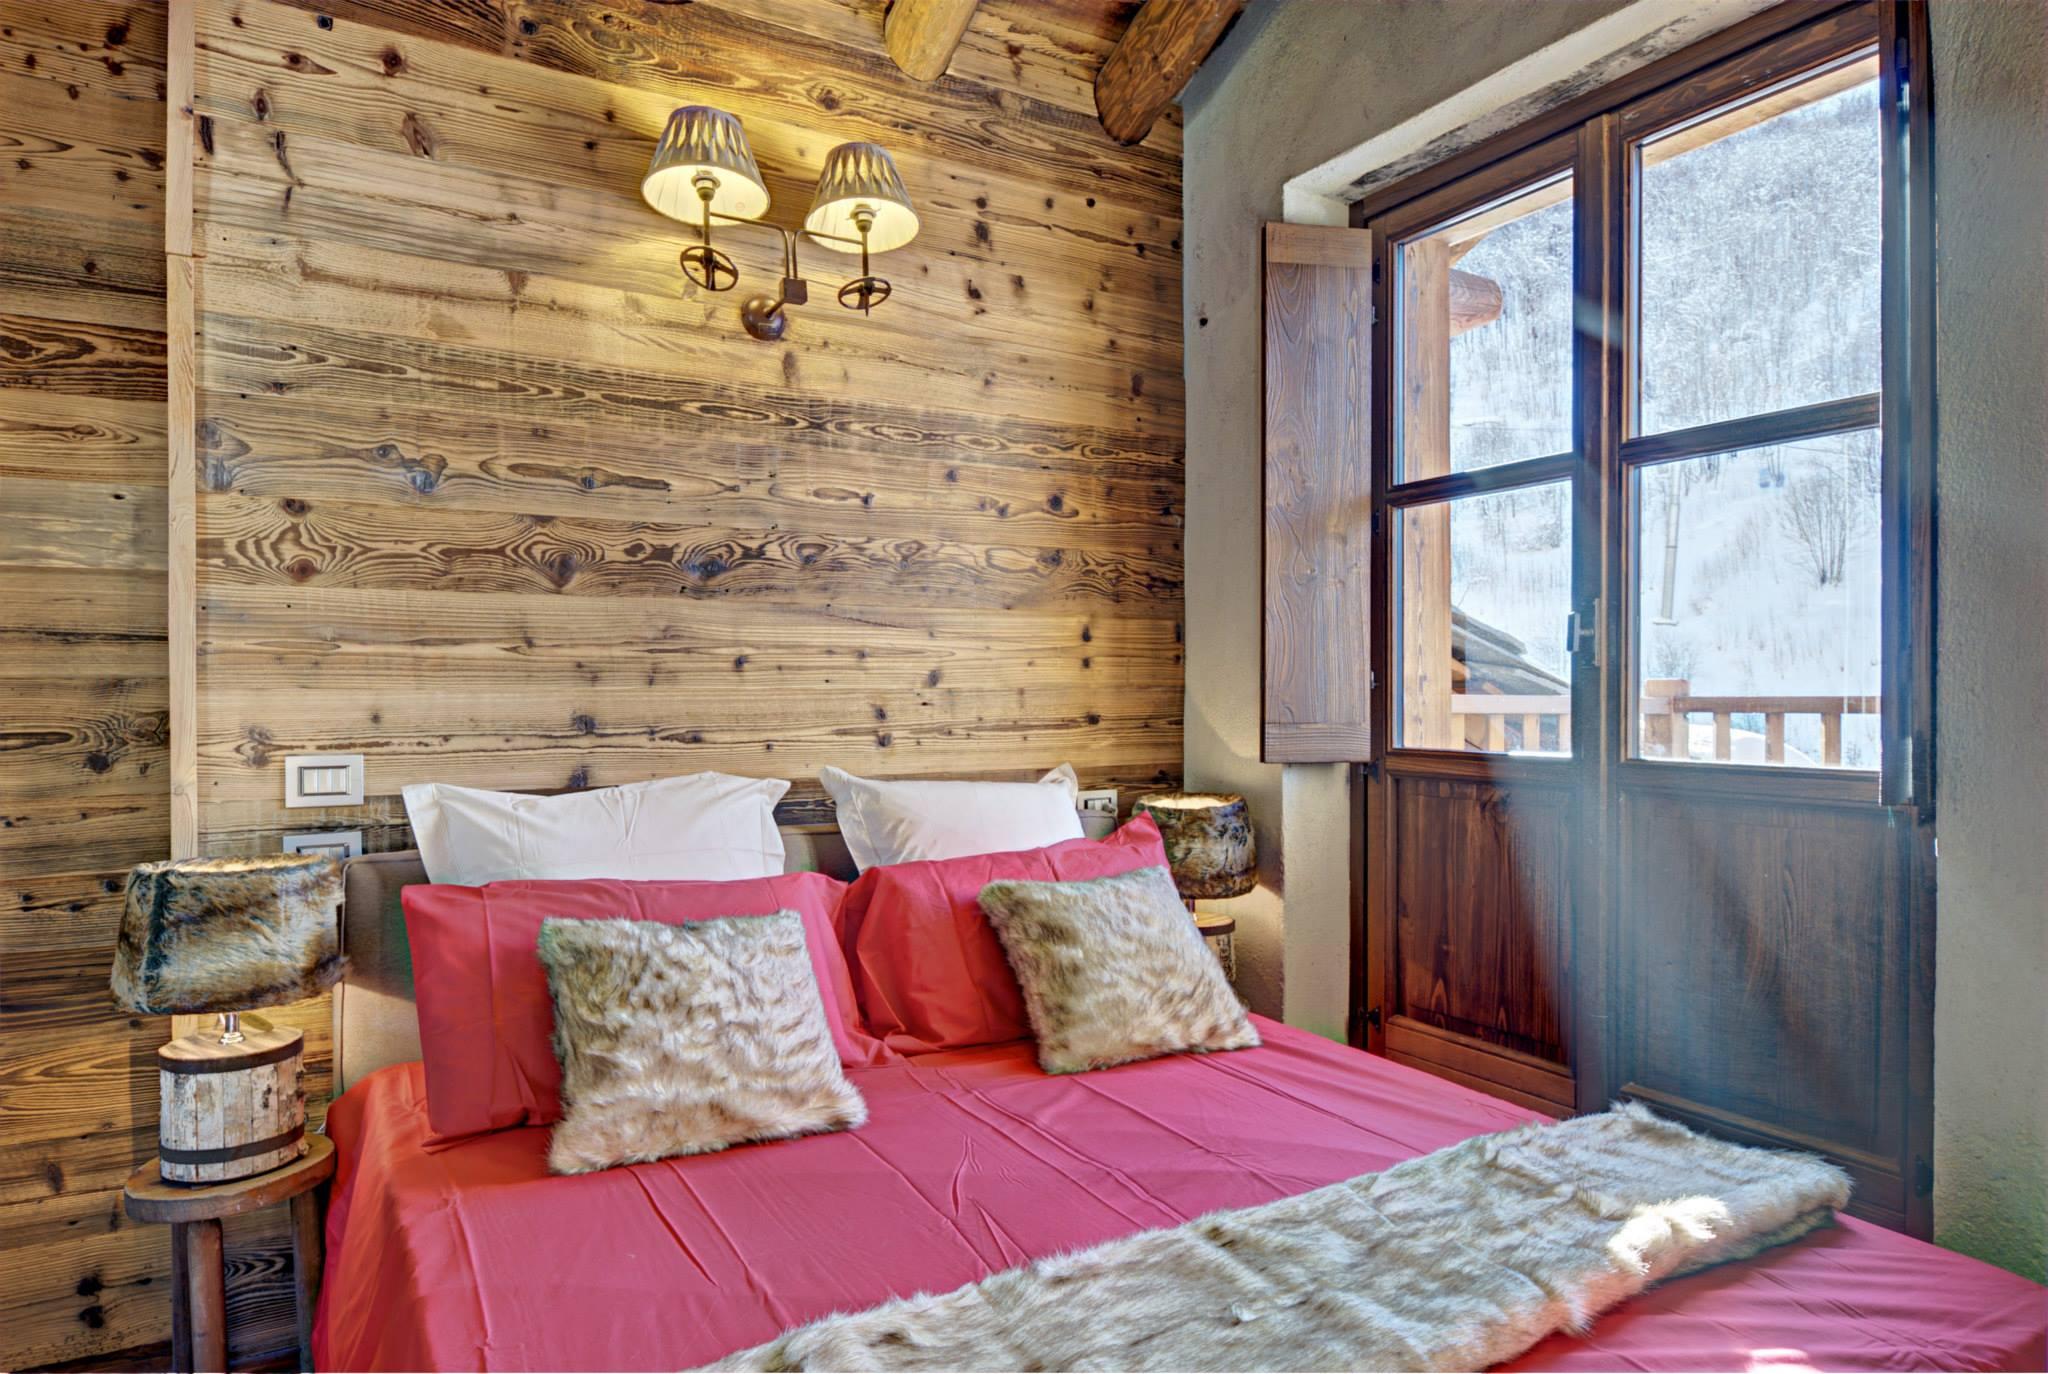 Dise o de interiores r stico uso de madera y piedra for Diseno de interiores para hogar